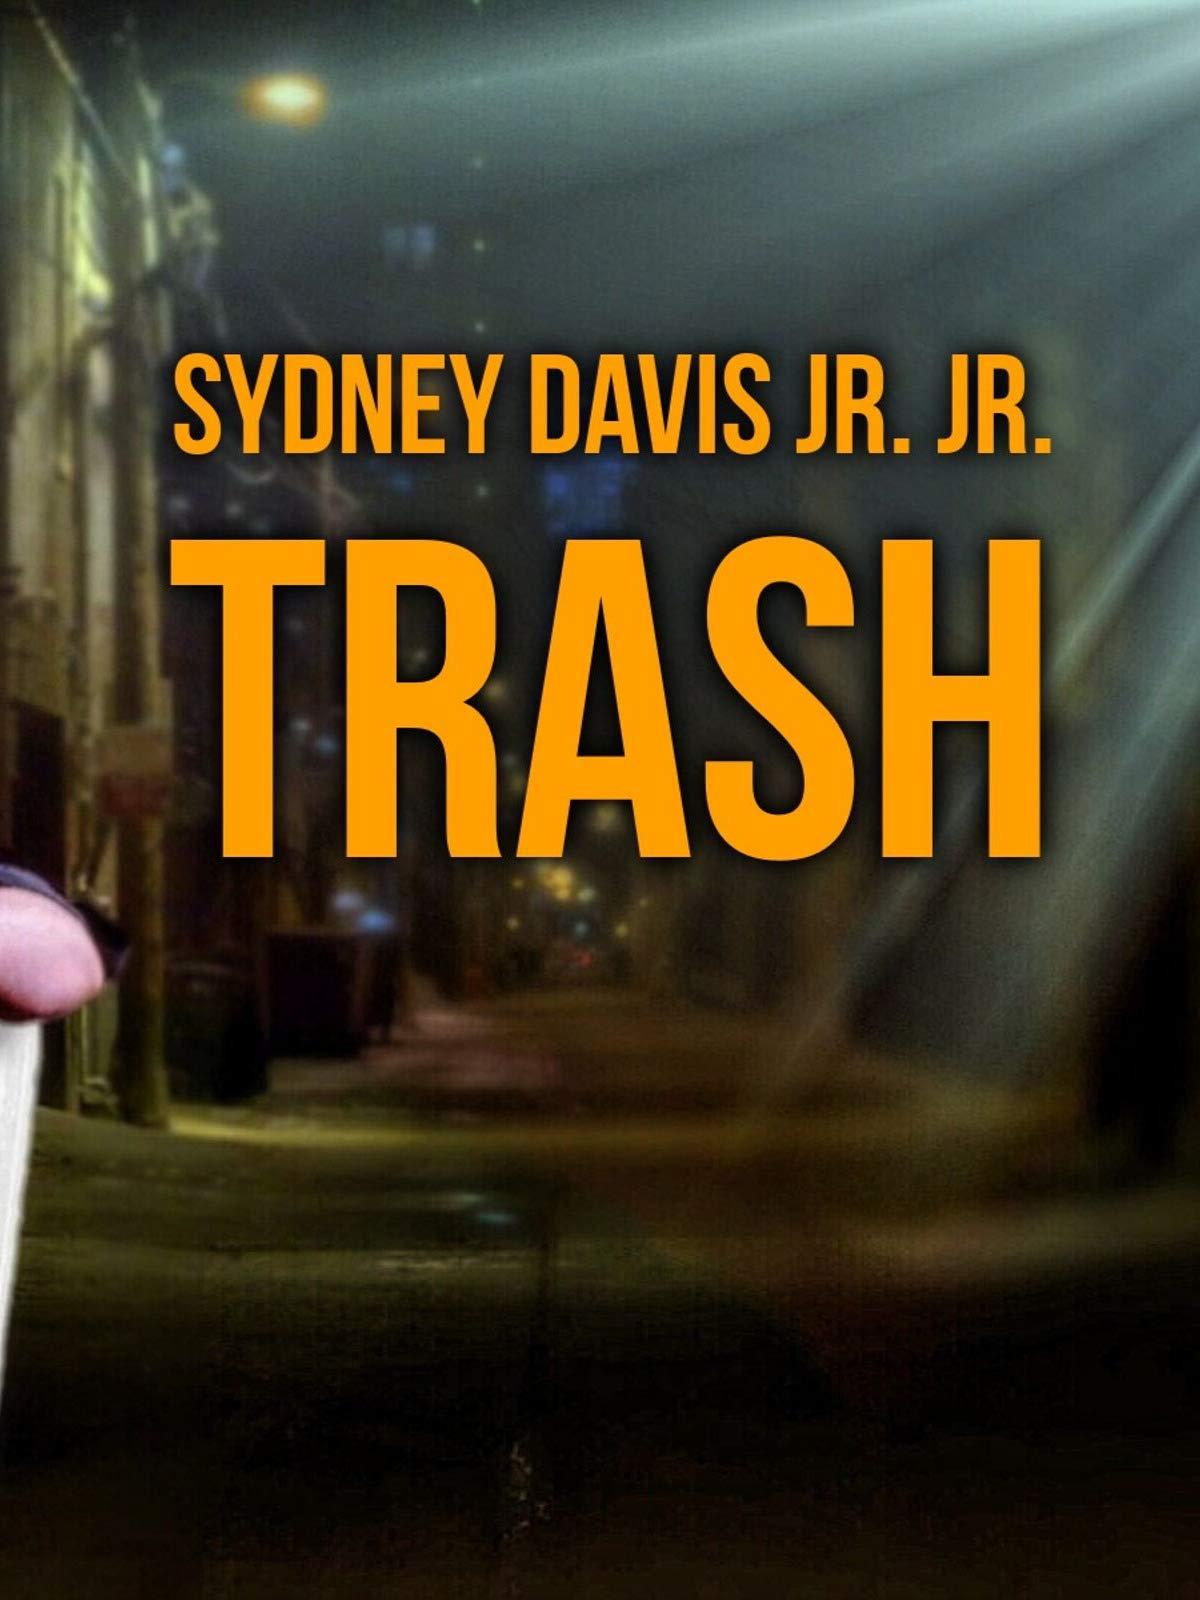 Sydney Davis Jr. Jr.: TRASH